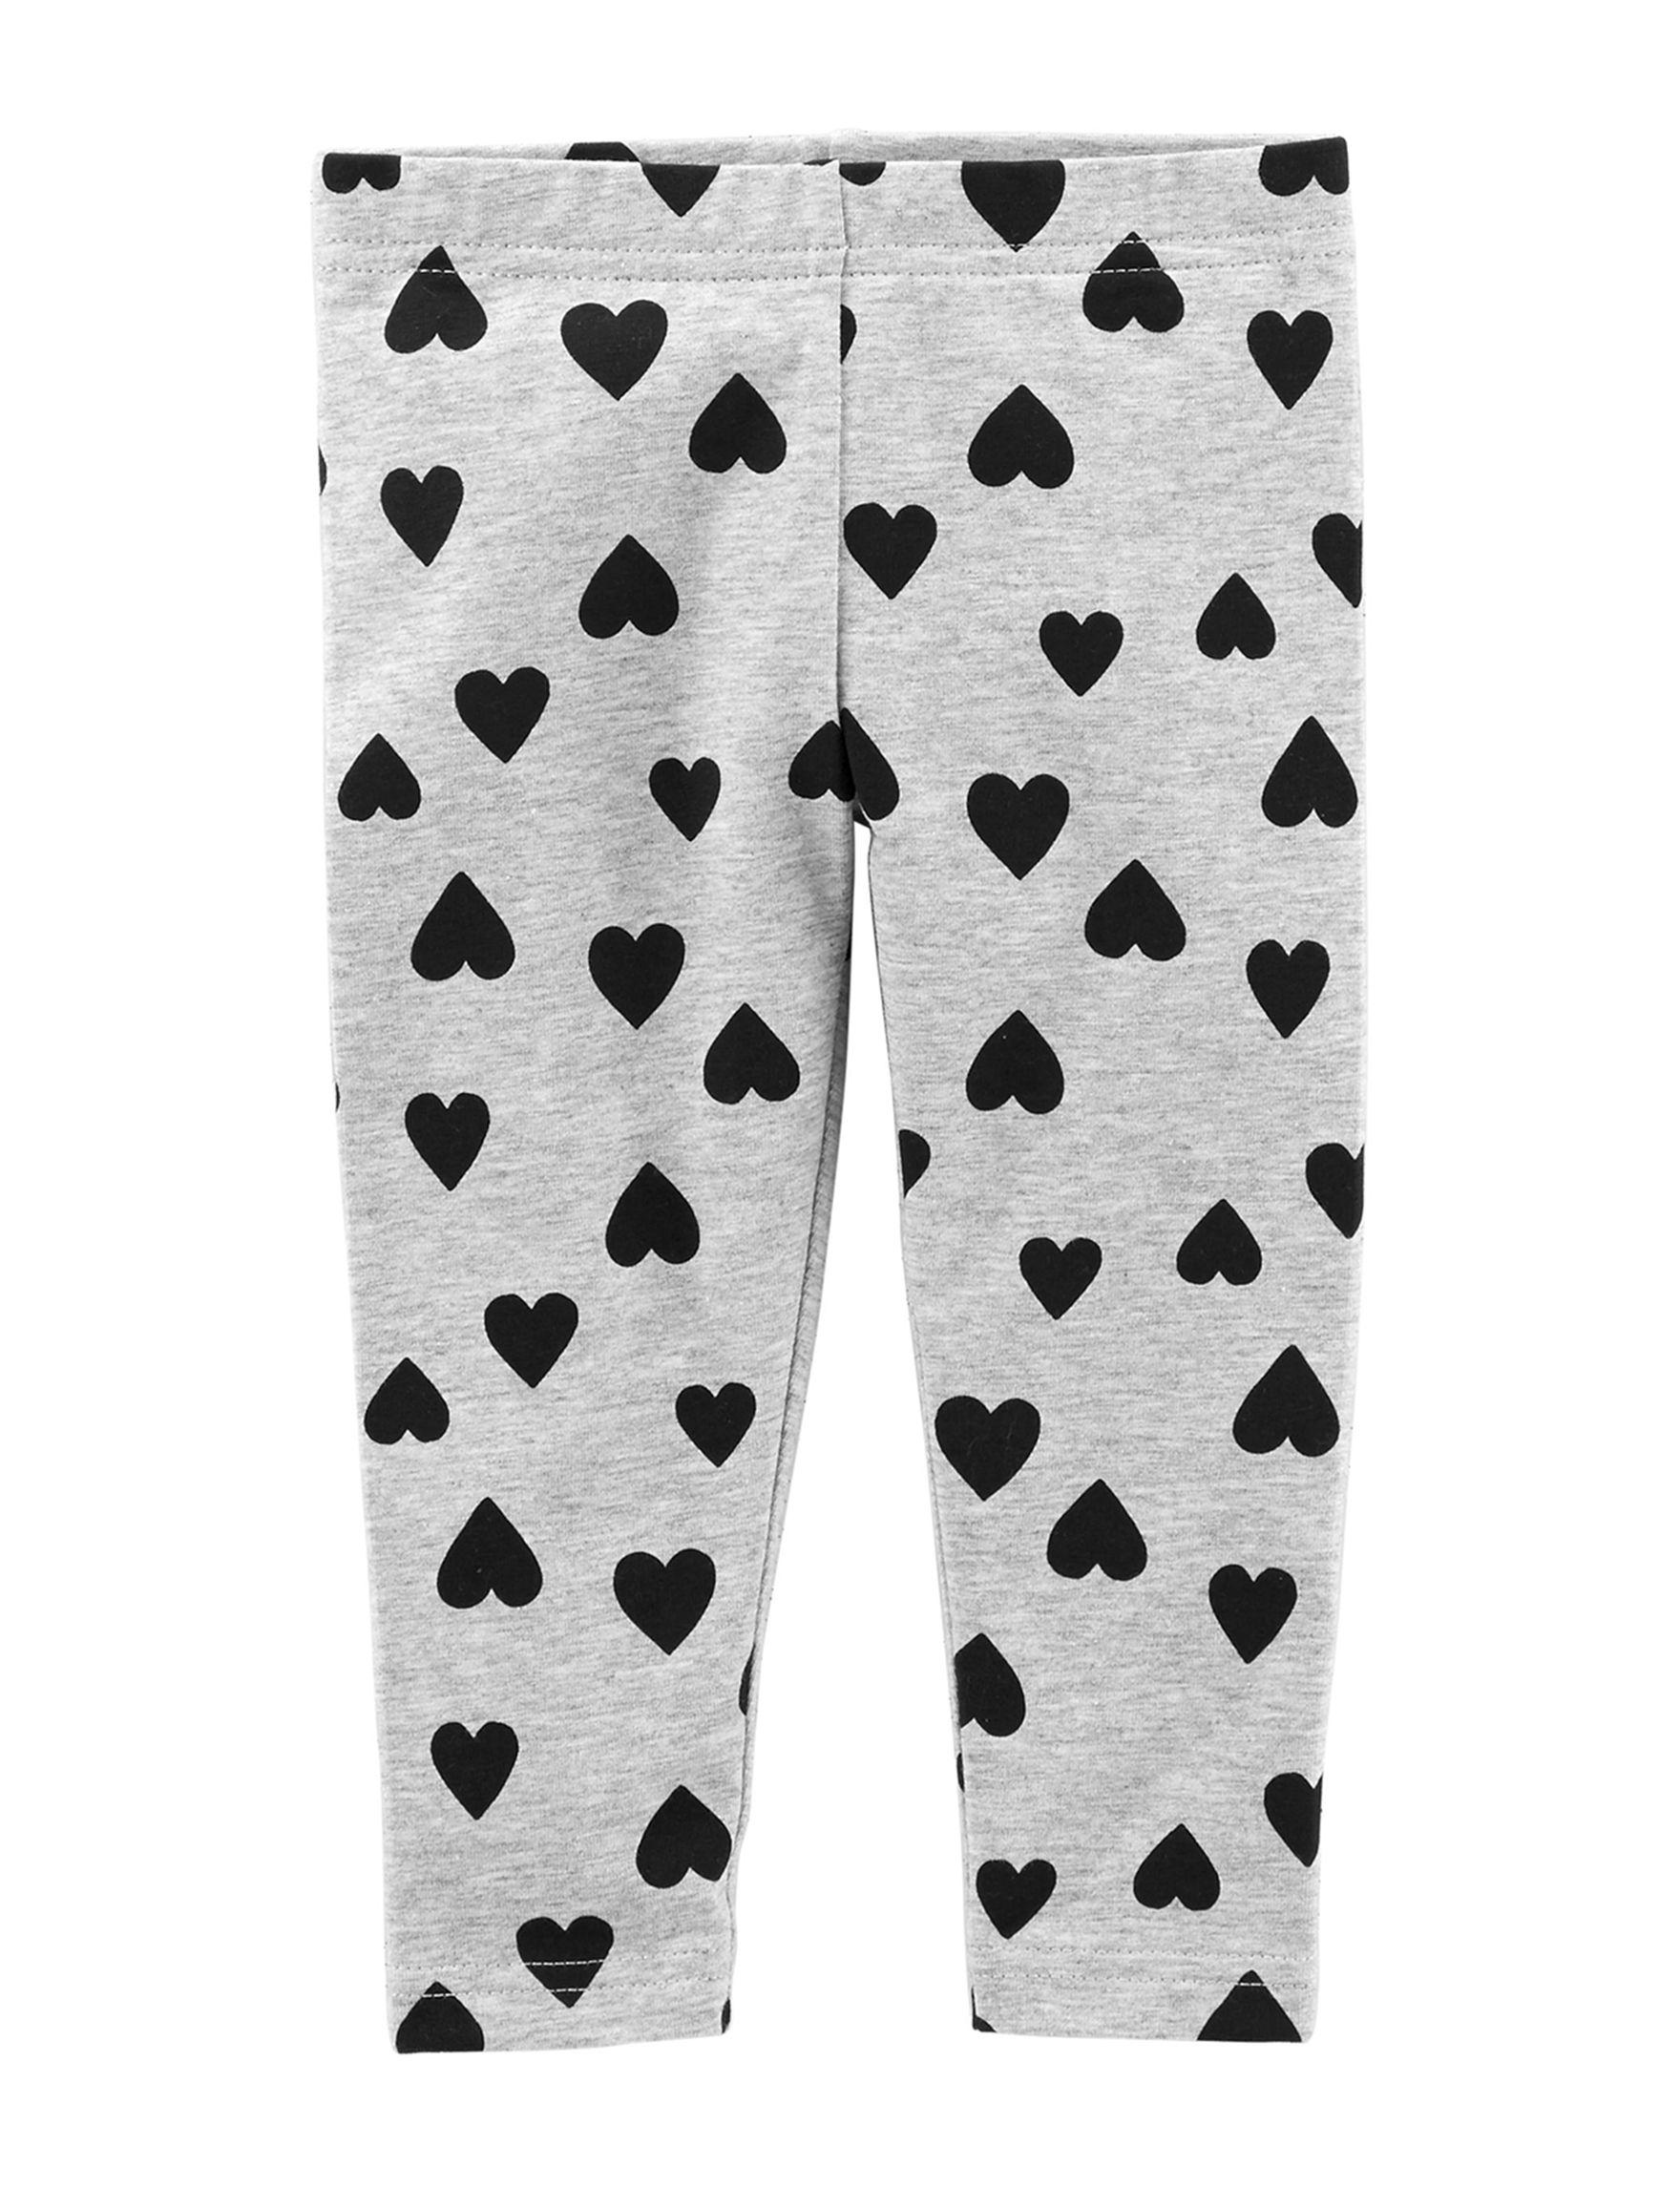 Carter's Grey / Black Leggings